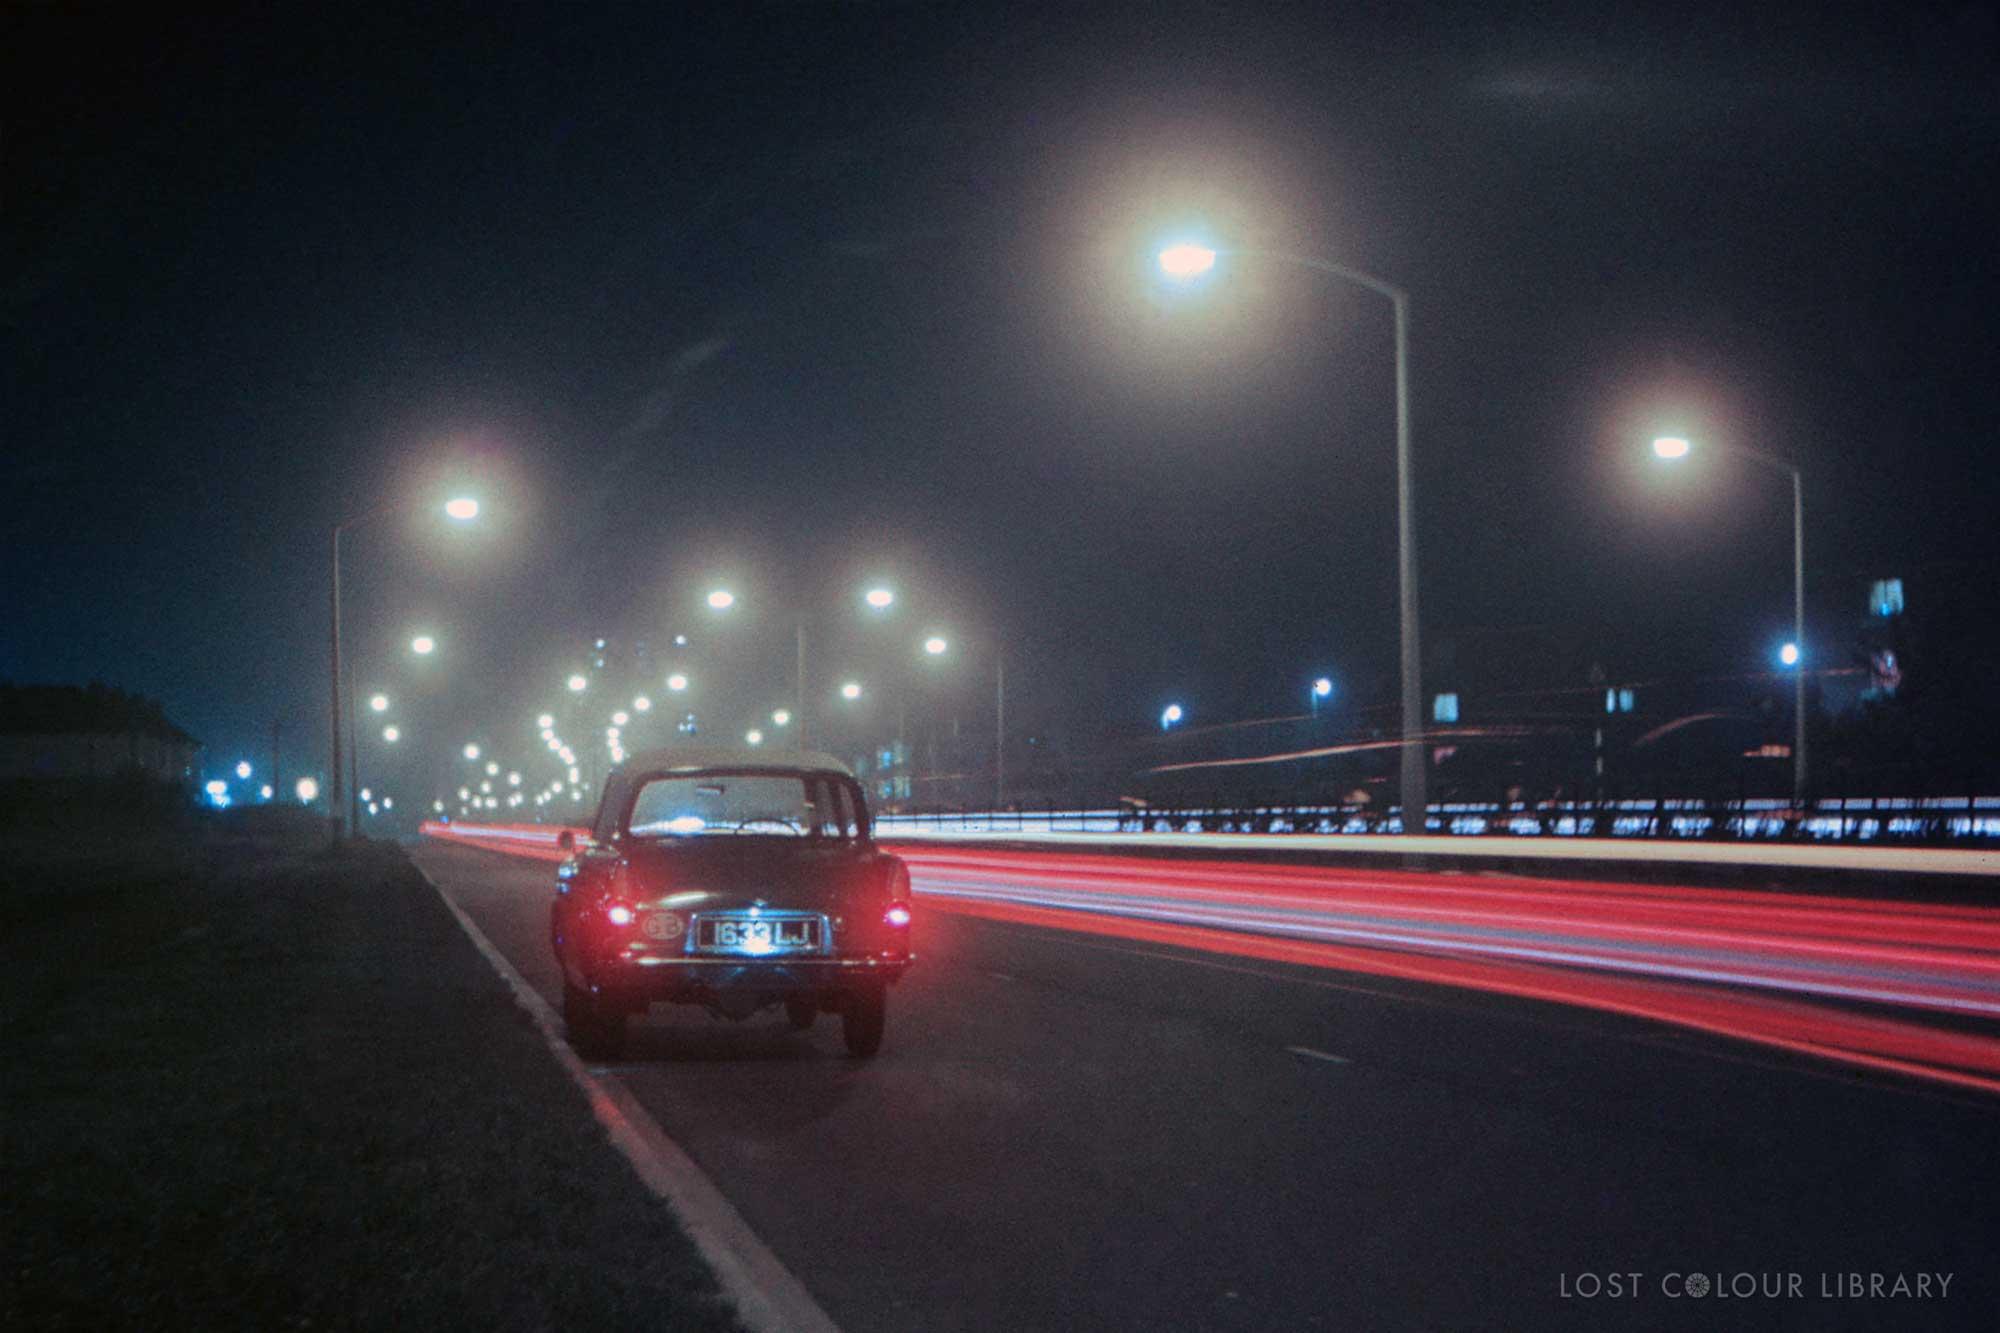 lcl-ww-anglia-lights-1960s-site-wm.jpg